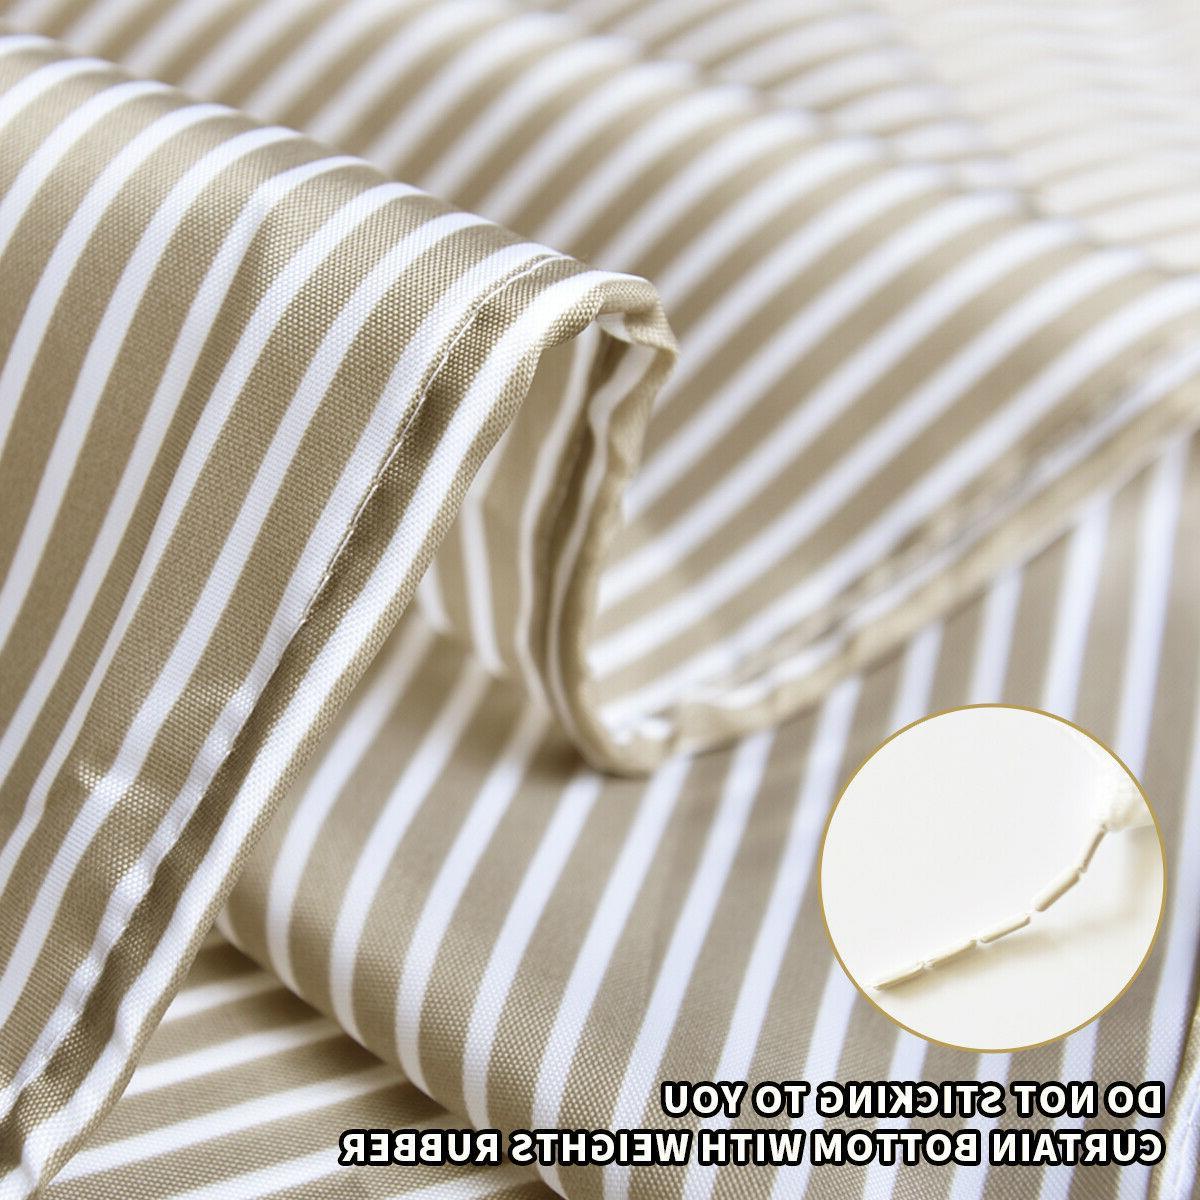 Beige Bathroom Shower Stripes Black,72x72